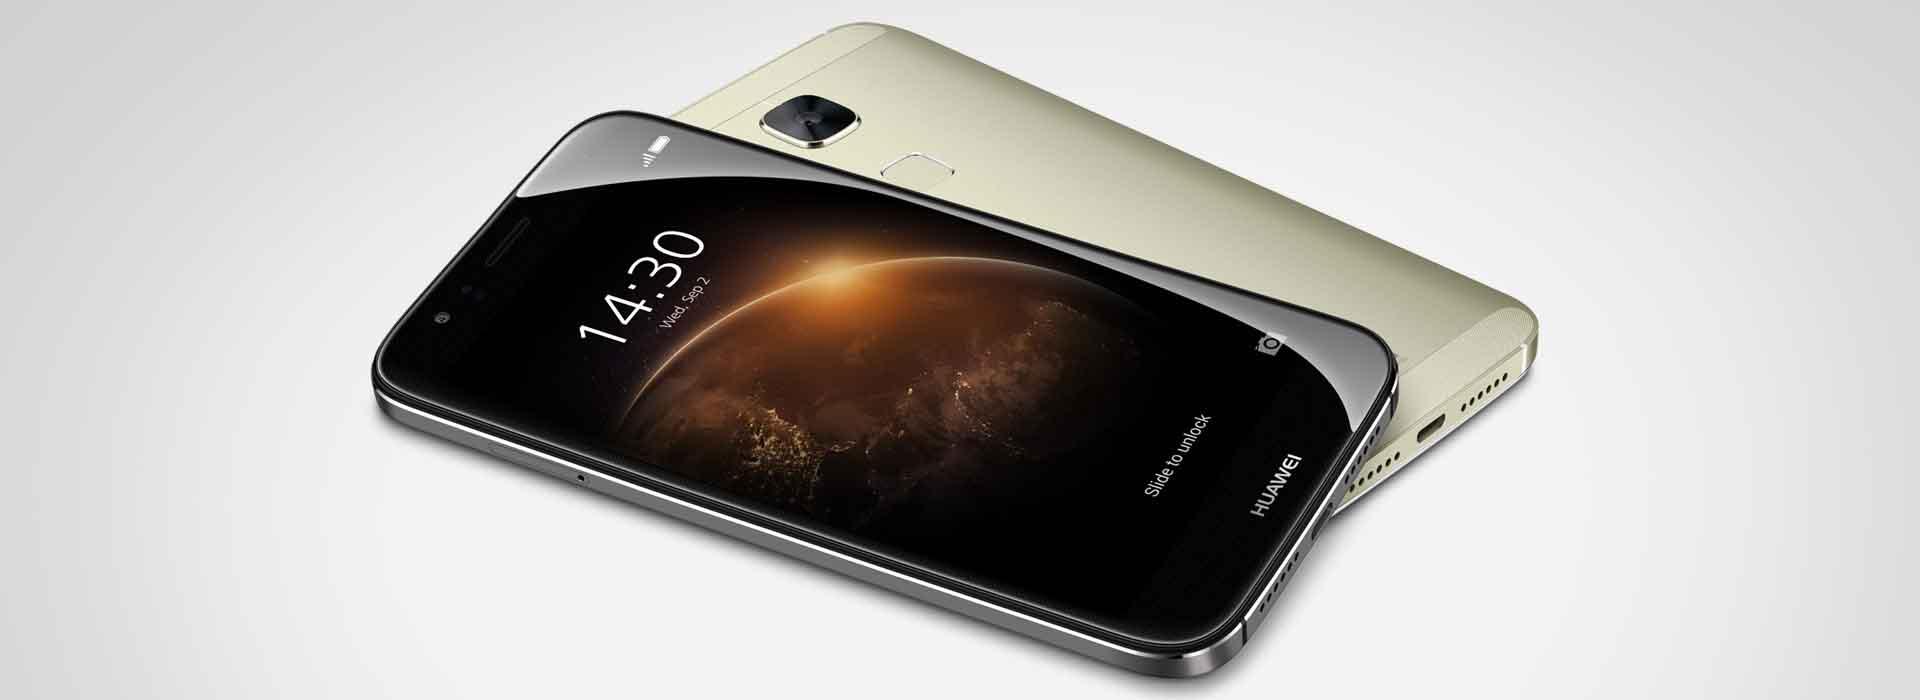 Huawei G8 Dual Sim 4G Gold The Full-Metal Experience